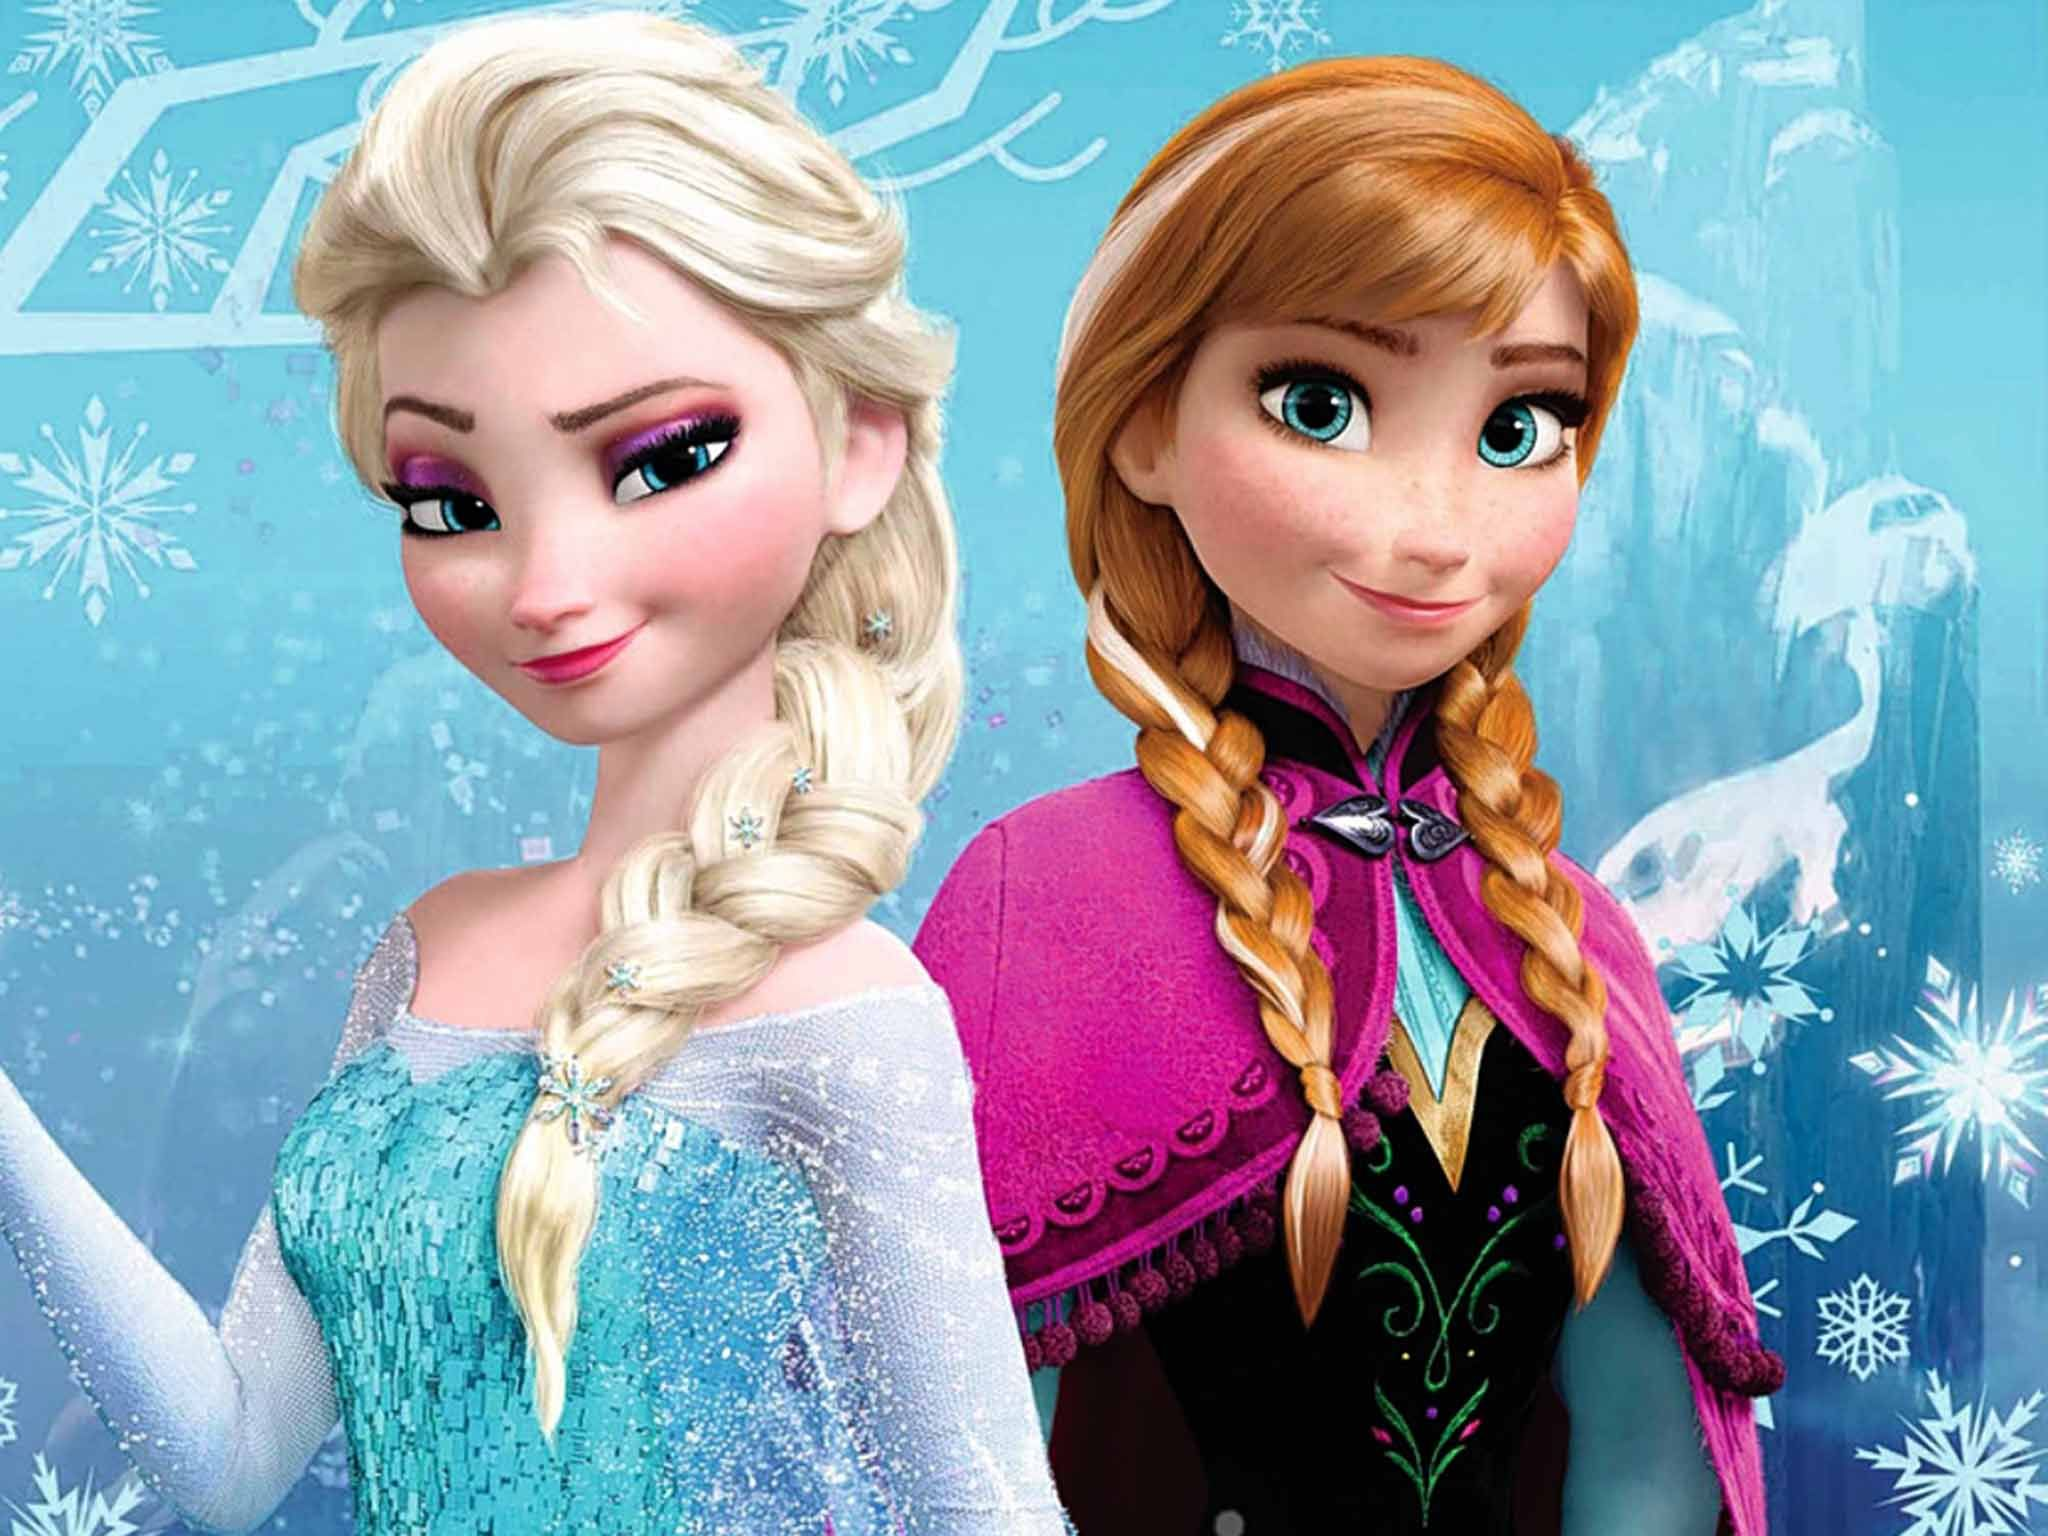 Uncategorized Picture Of Frozen frozen kraina lodu gry online dla dzieci elsa i anna bohaterki bajki disney